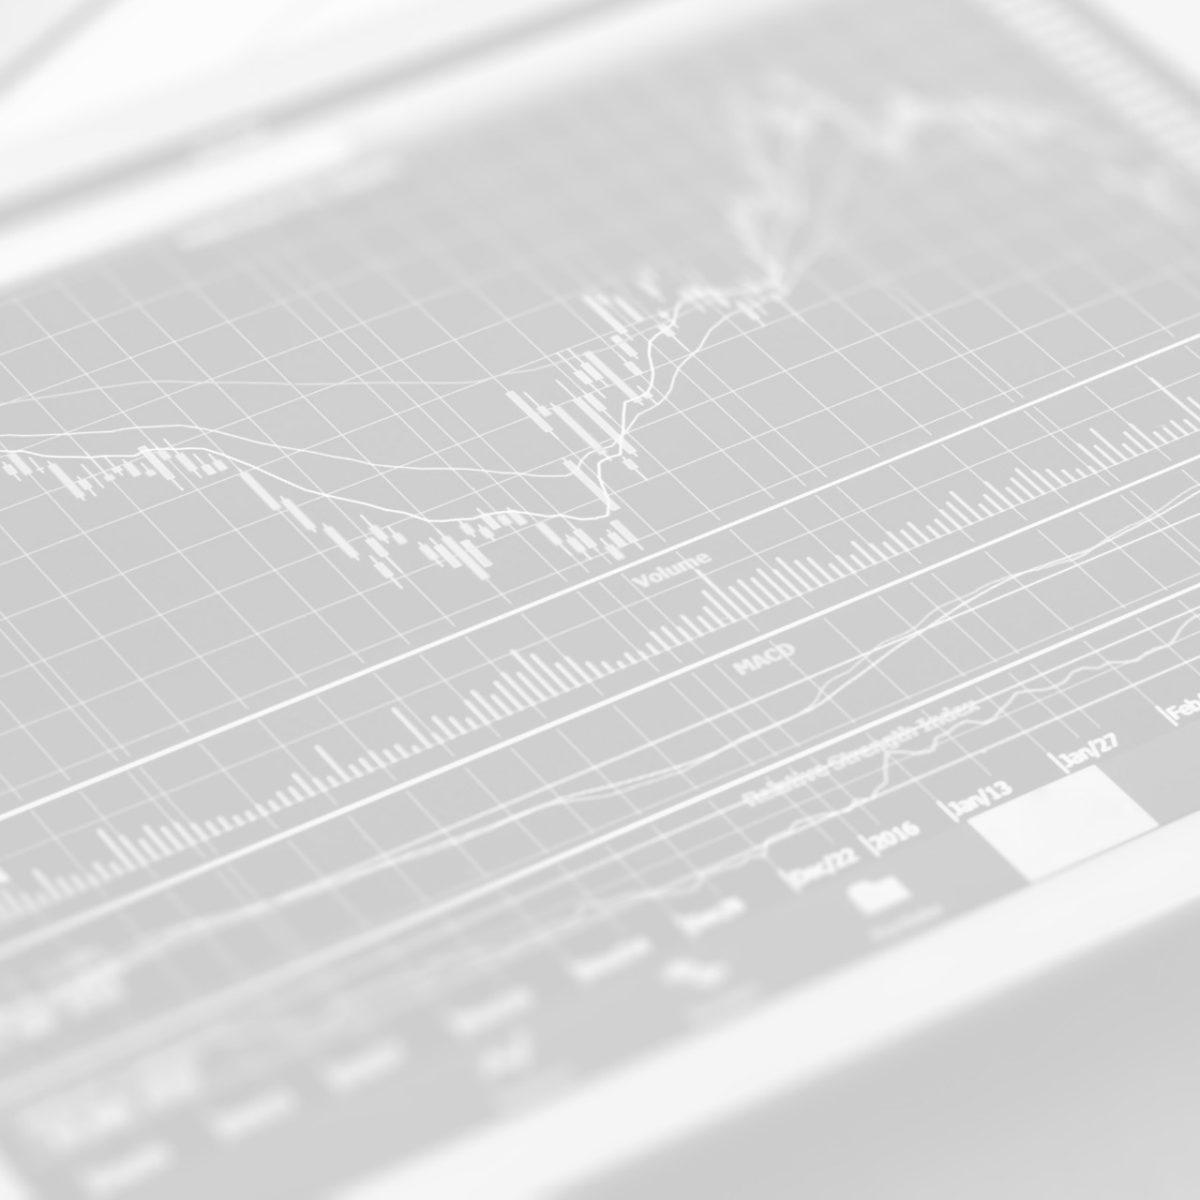 fintech-stock-market-monitoring